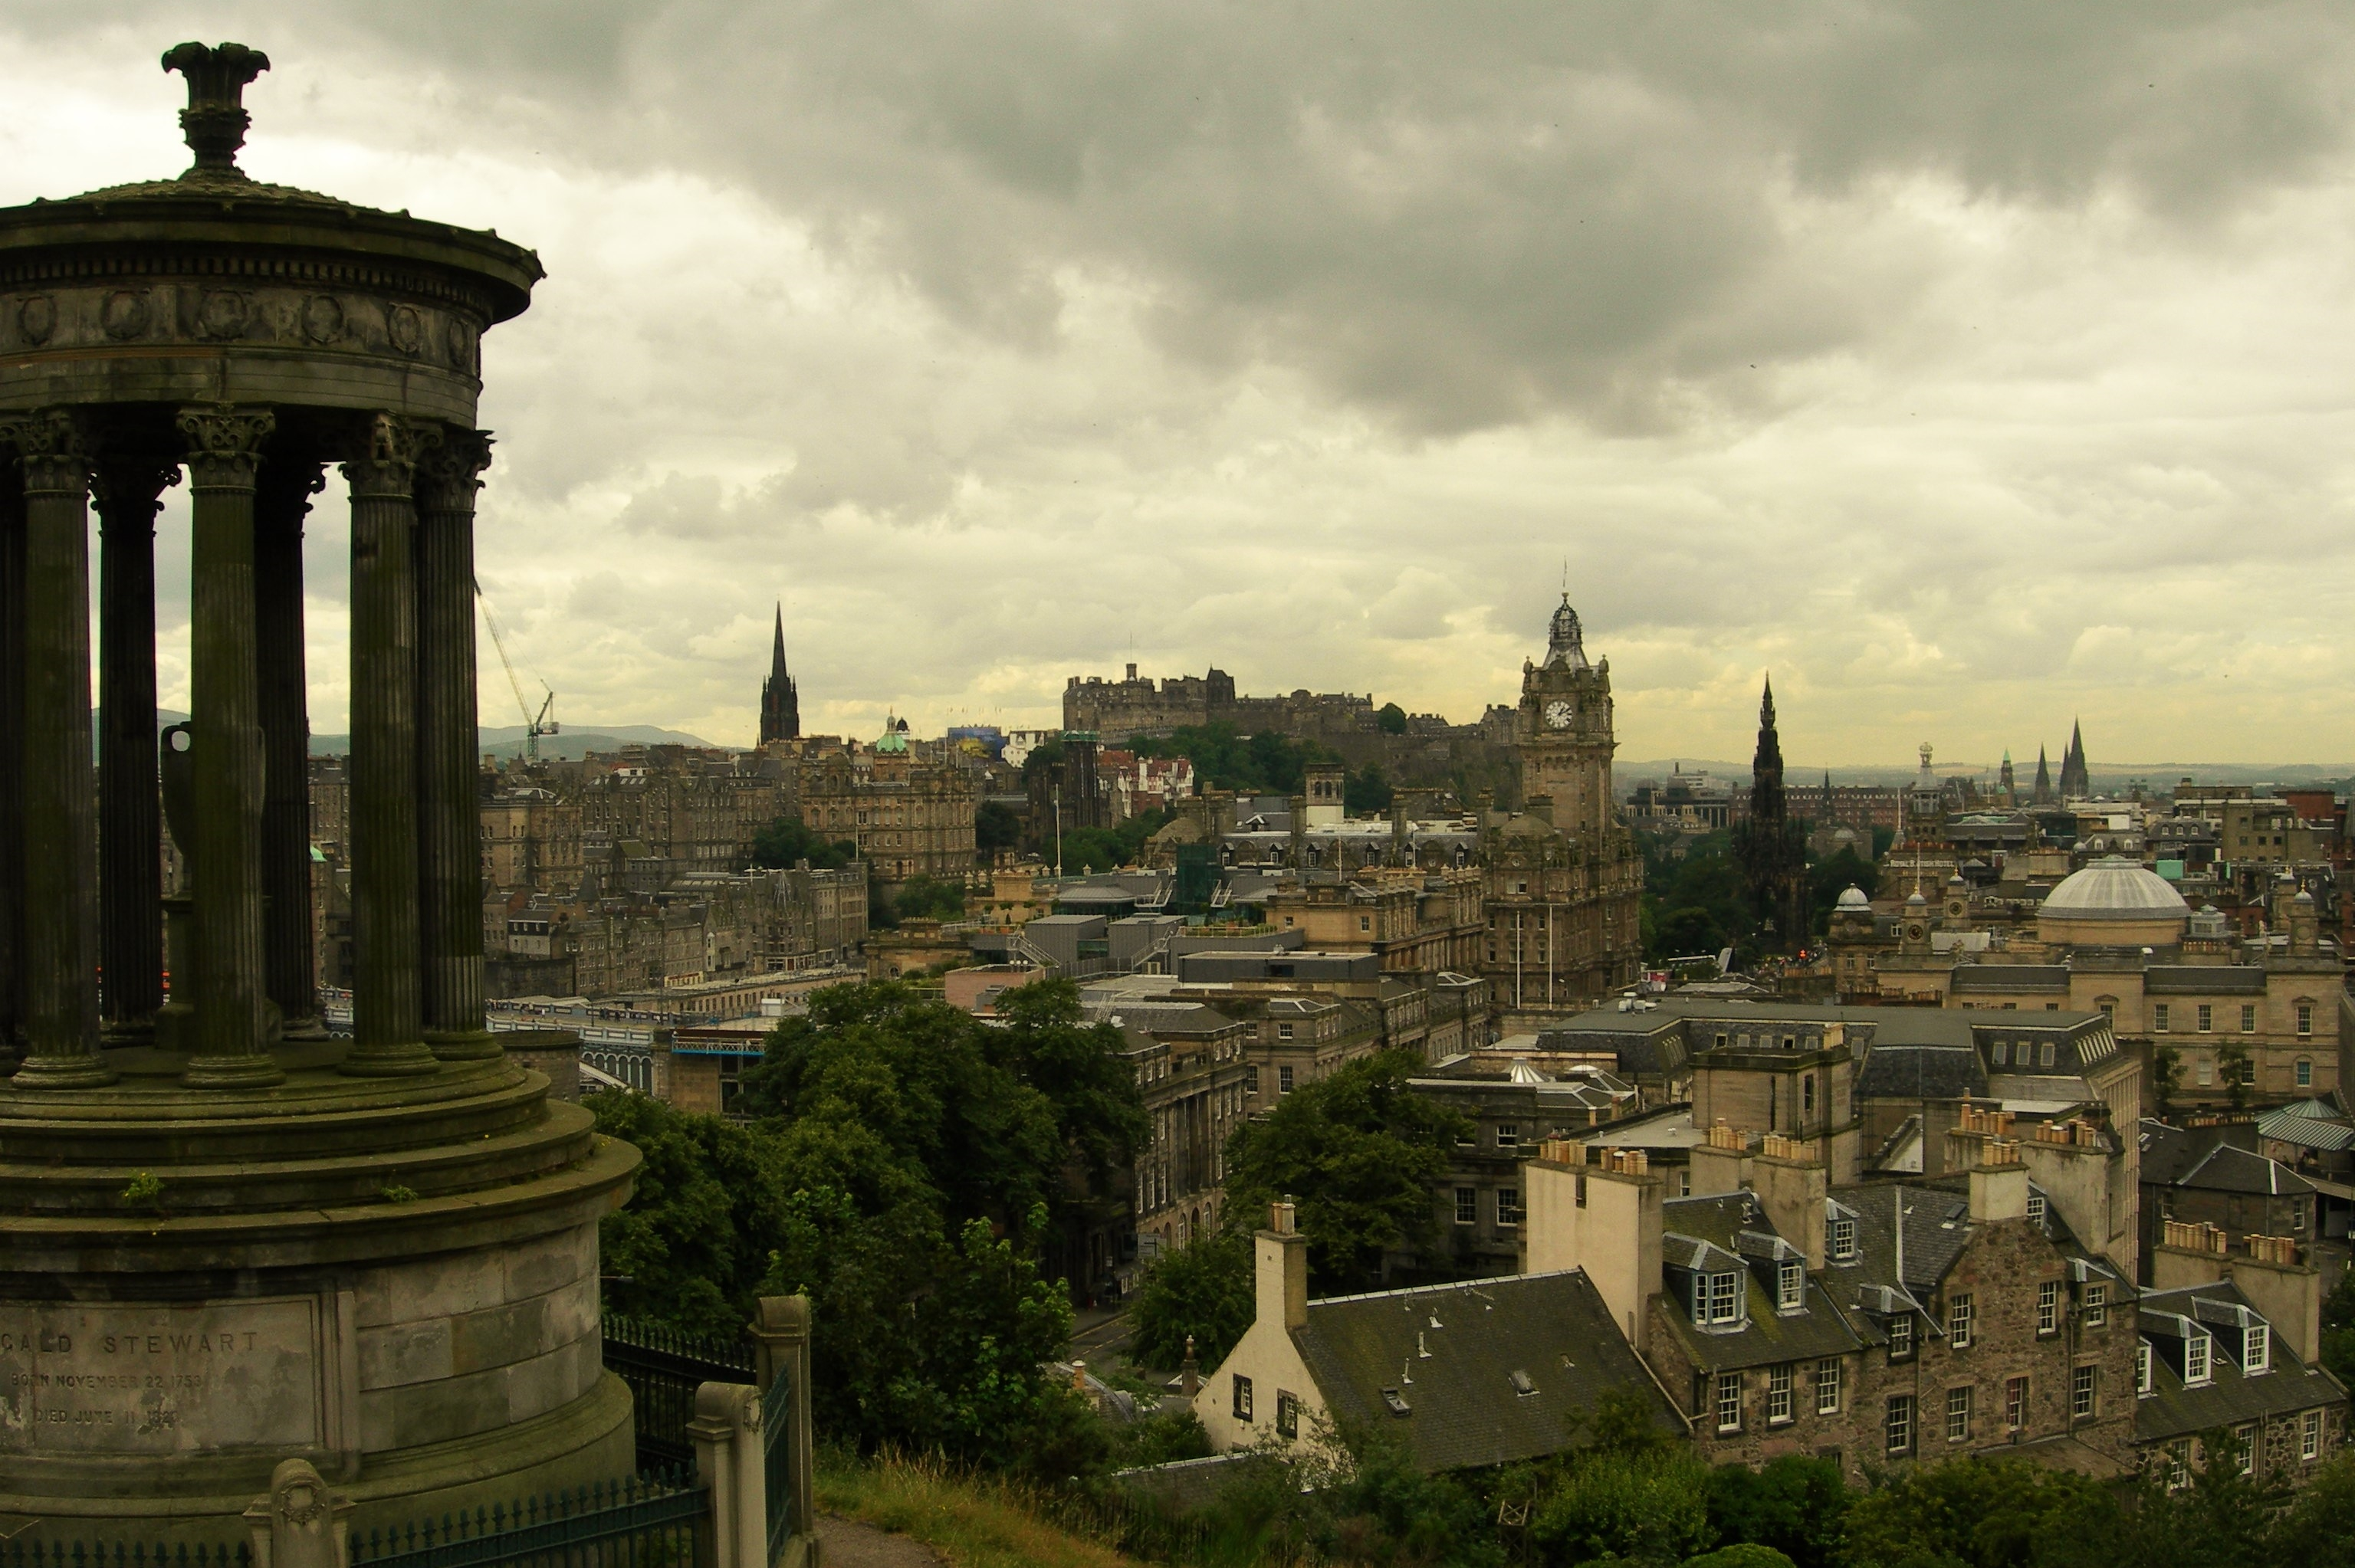 Elevation of Princes Street, Princes St, Edinburgh, UK - Topographic ...